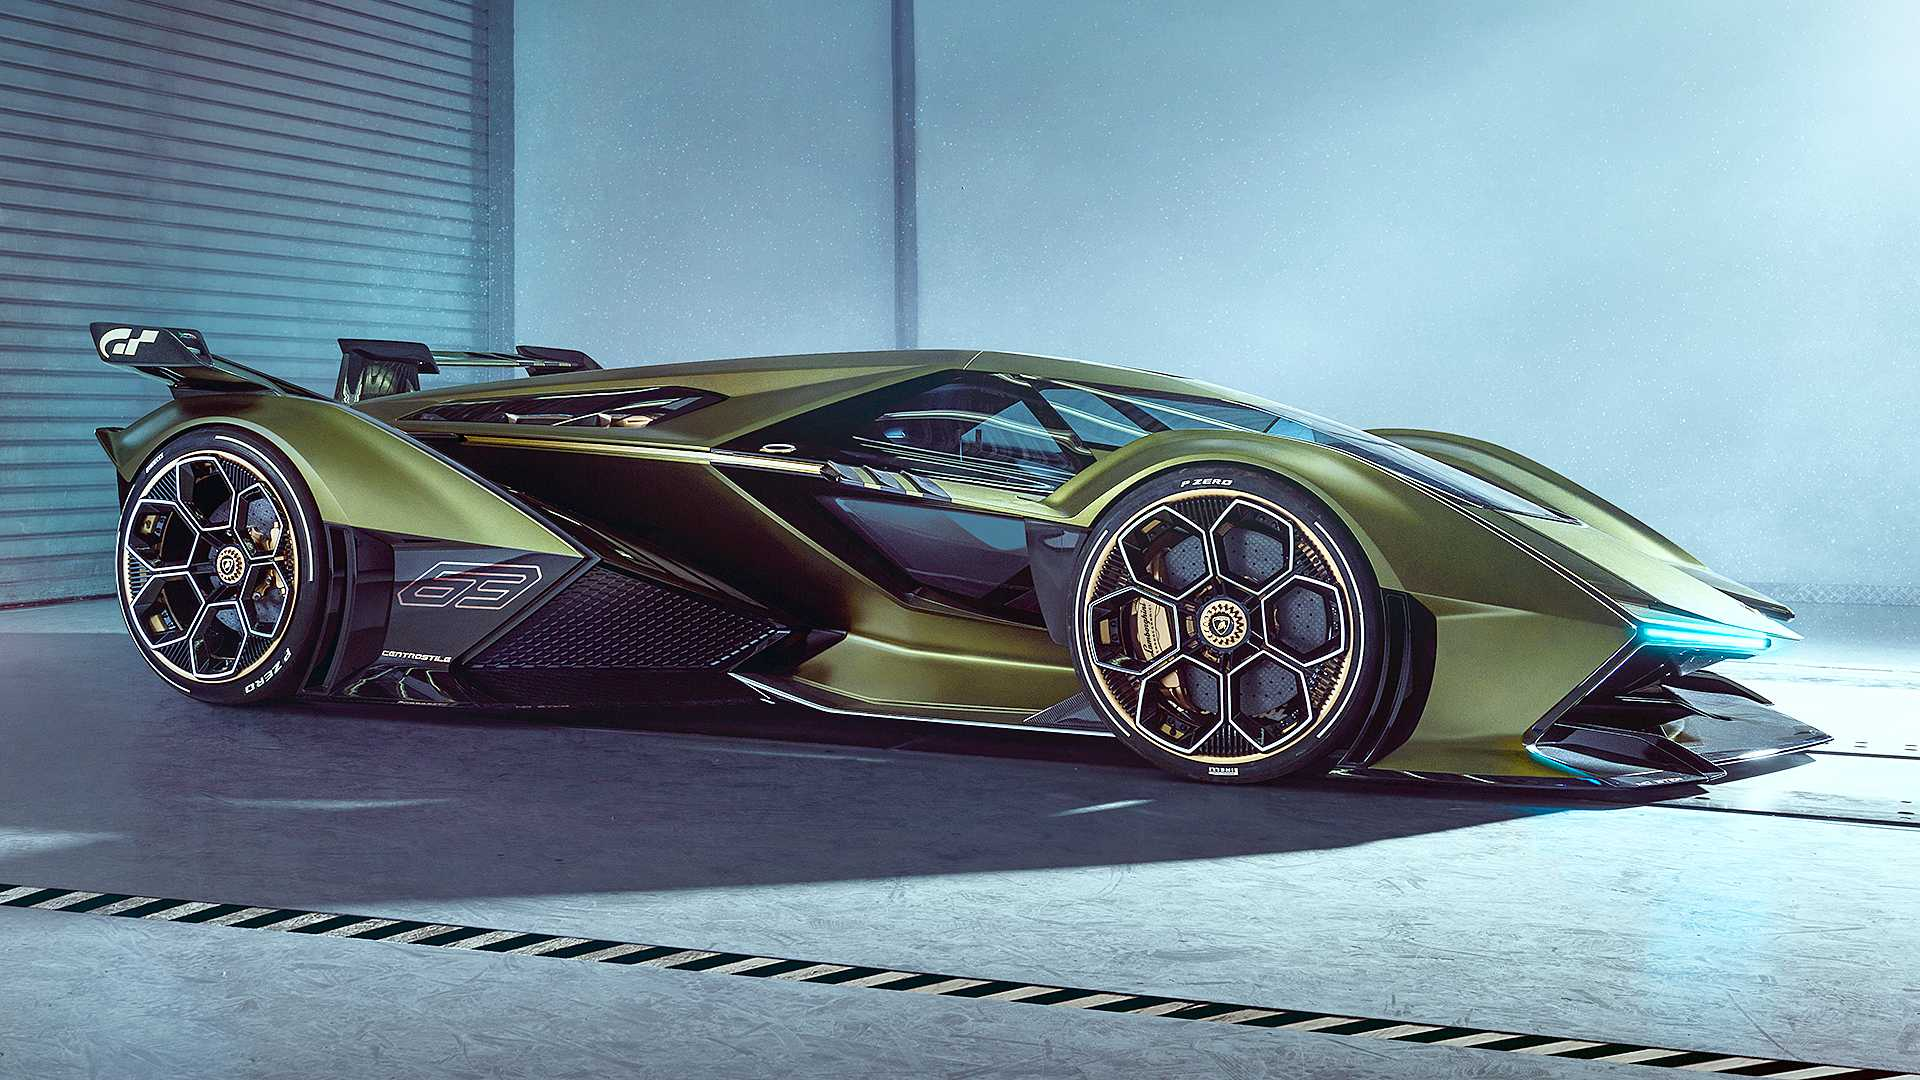 Lamborghini-V12-Vision-Gran-Turismo-5